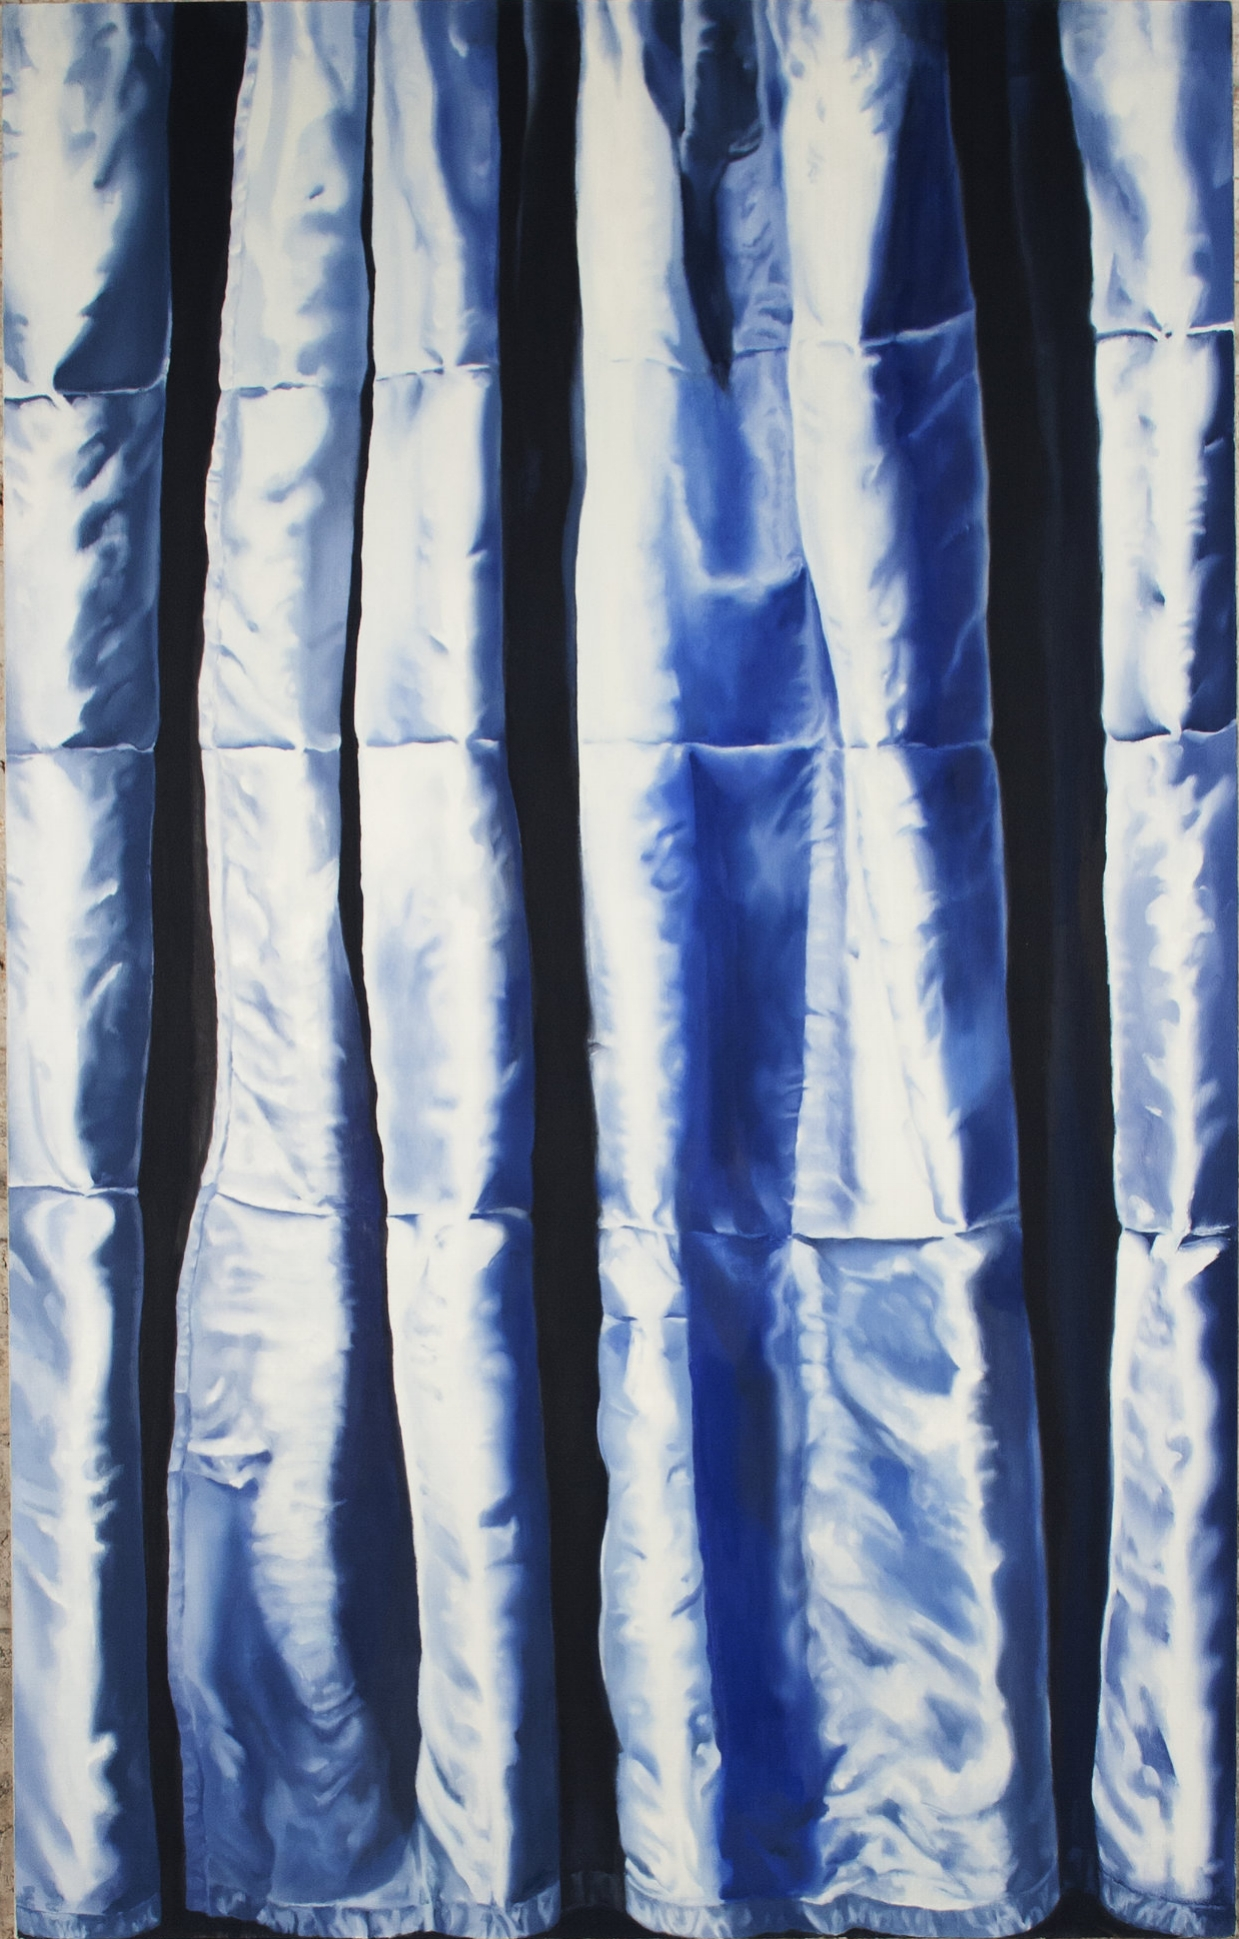 Curtain Drawn 2014 Oil on canvas 36 x 60 inches.jpg